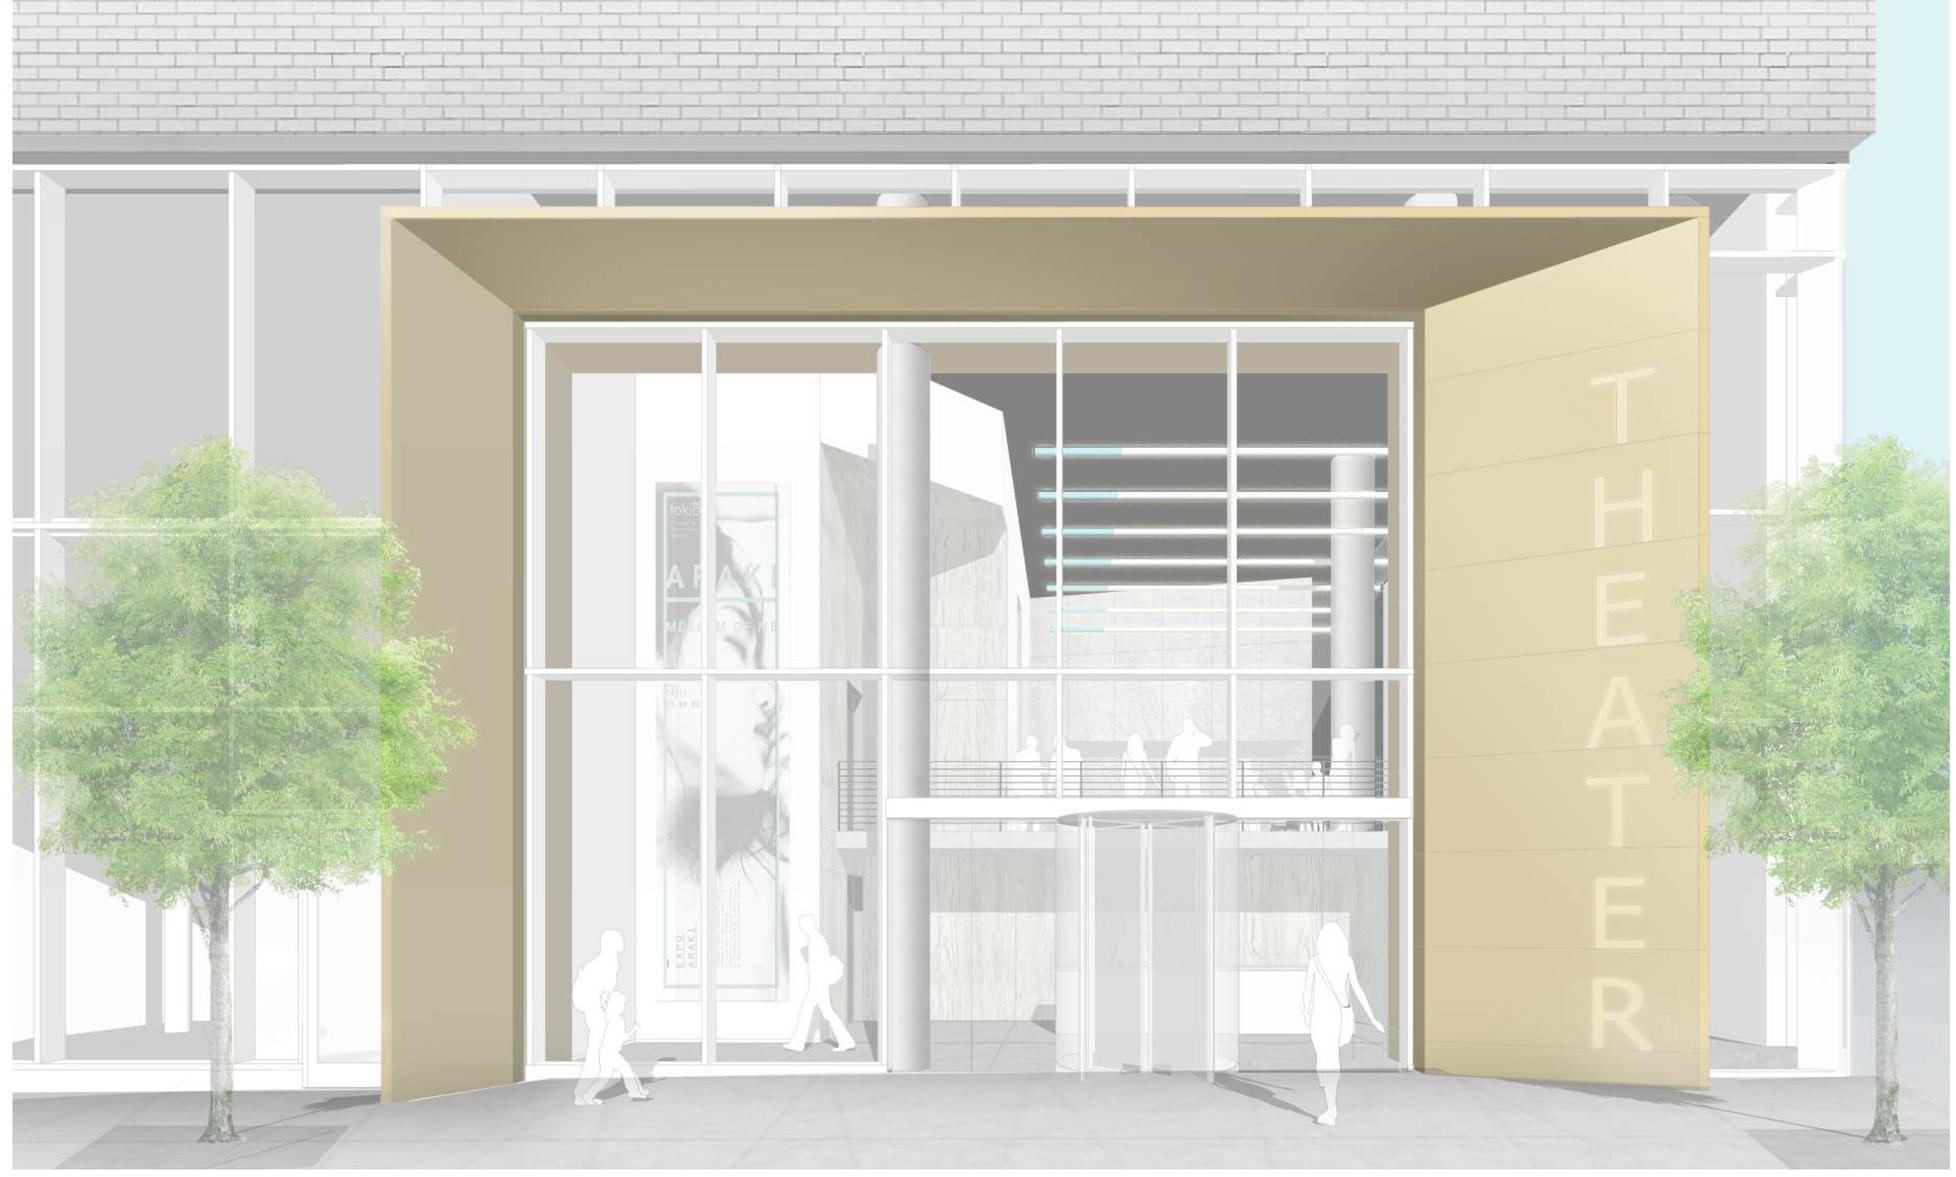 Nimbus Arts Center Entrance  FOGARTY FINGER architecture | interiors